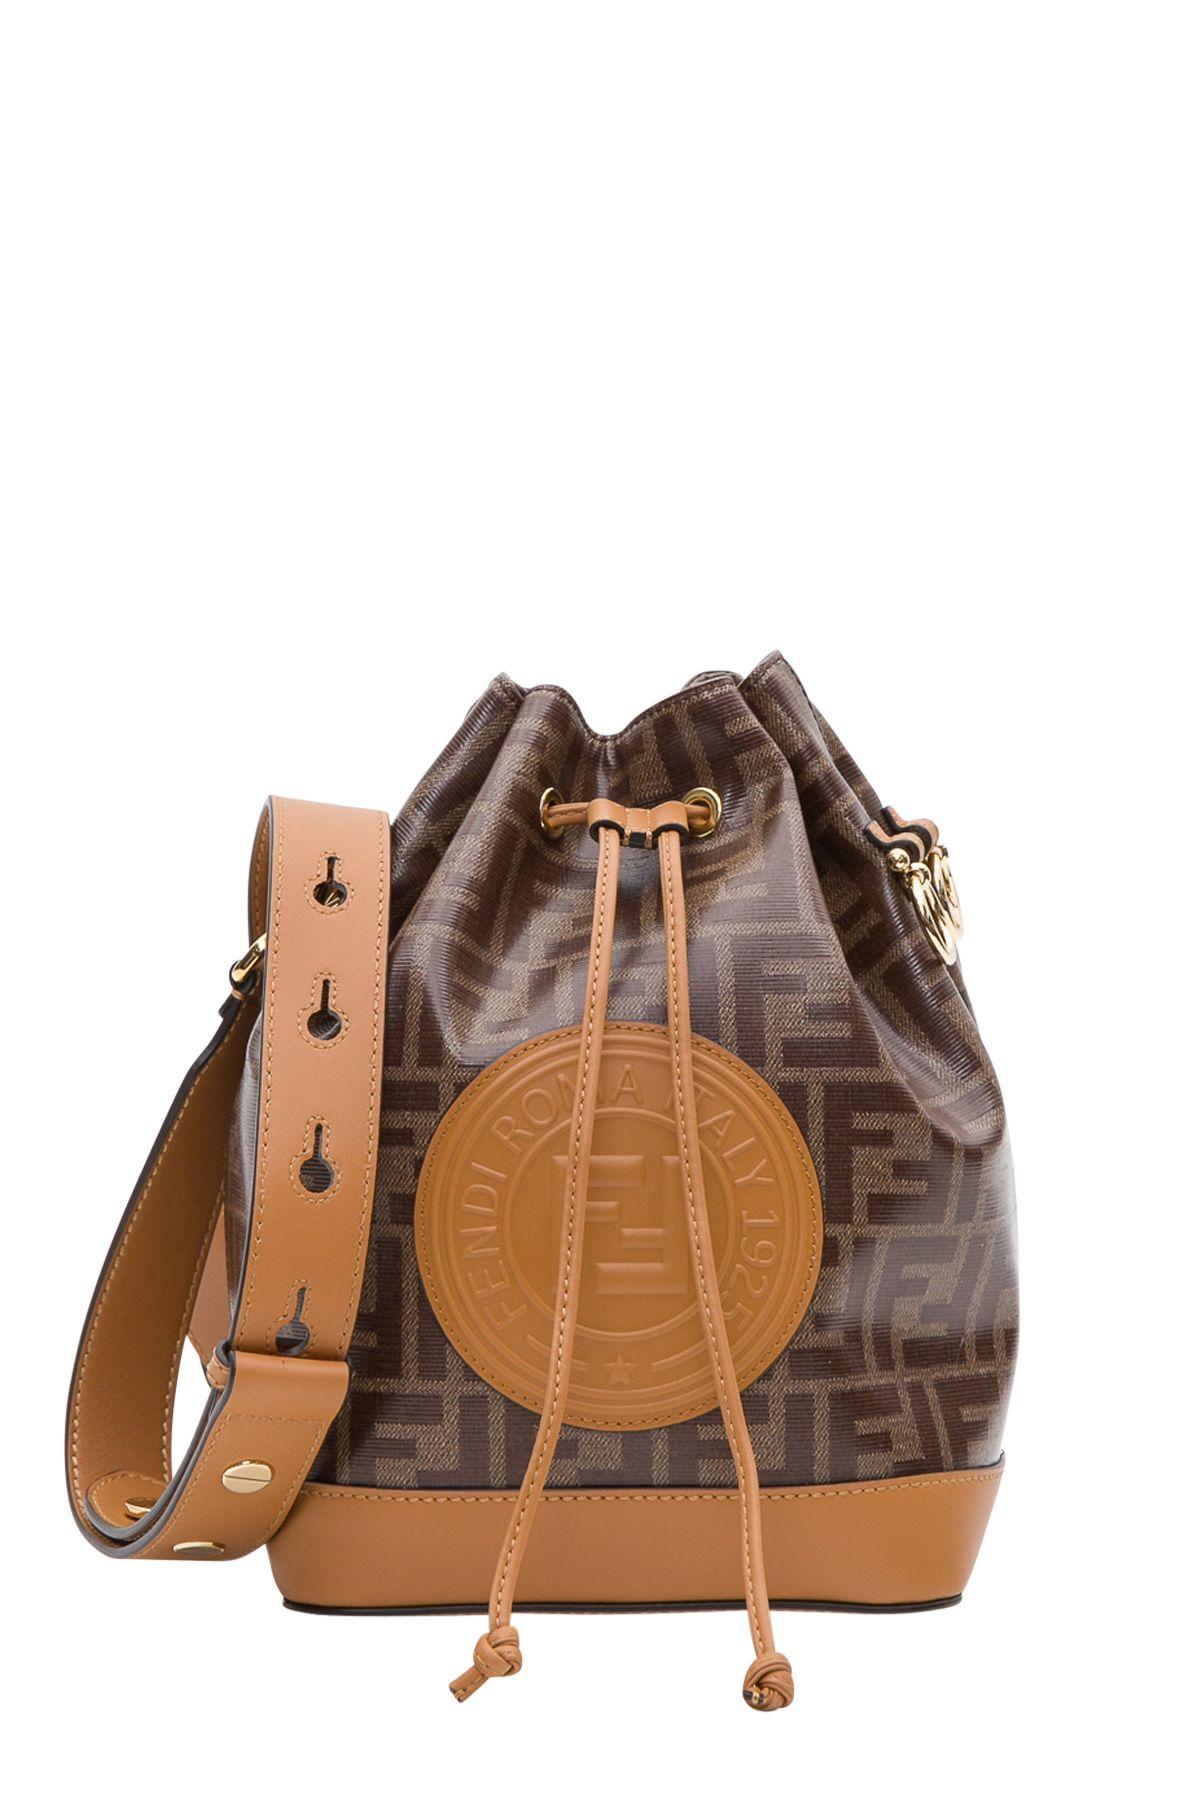 06e6a30b58b Shop Fendi Mon Tresor Bucket Bag In Marrone